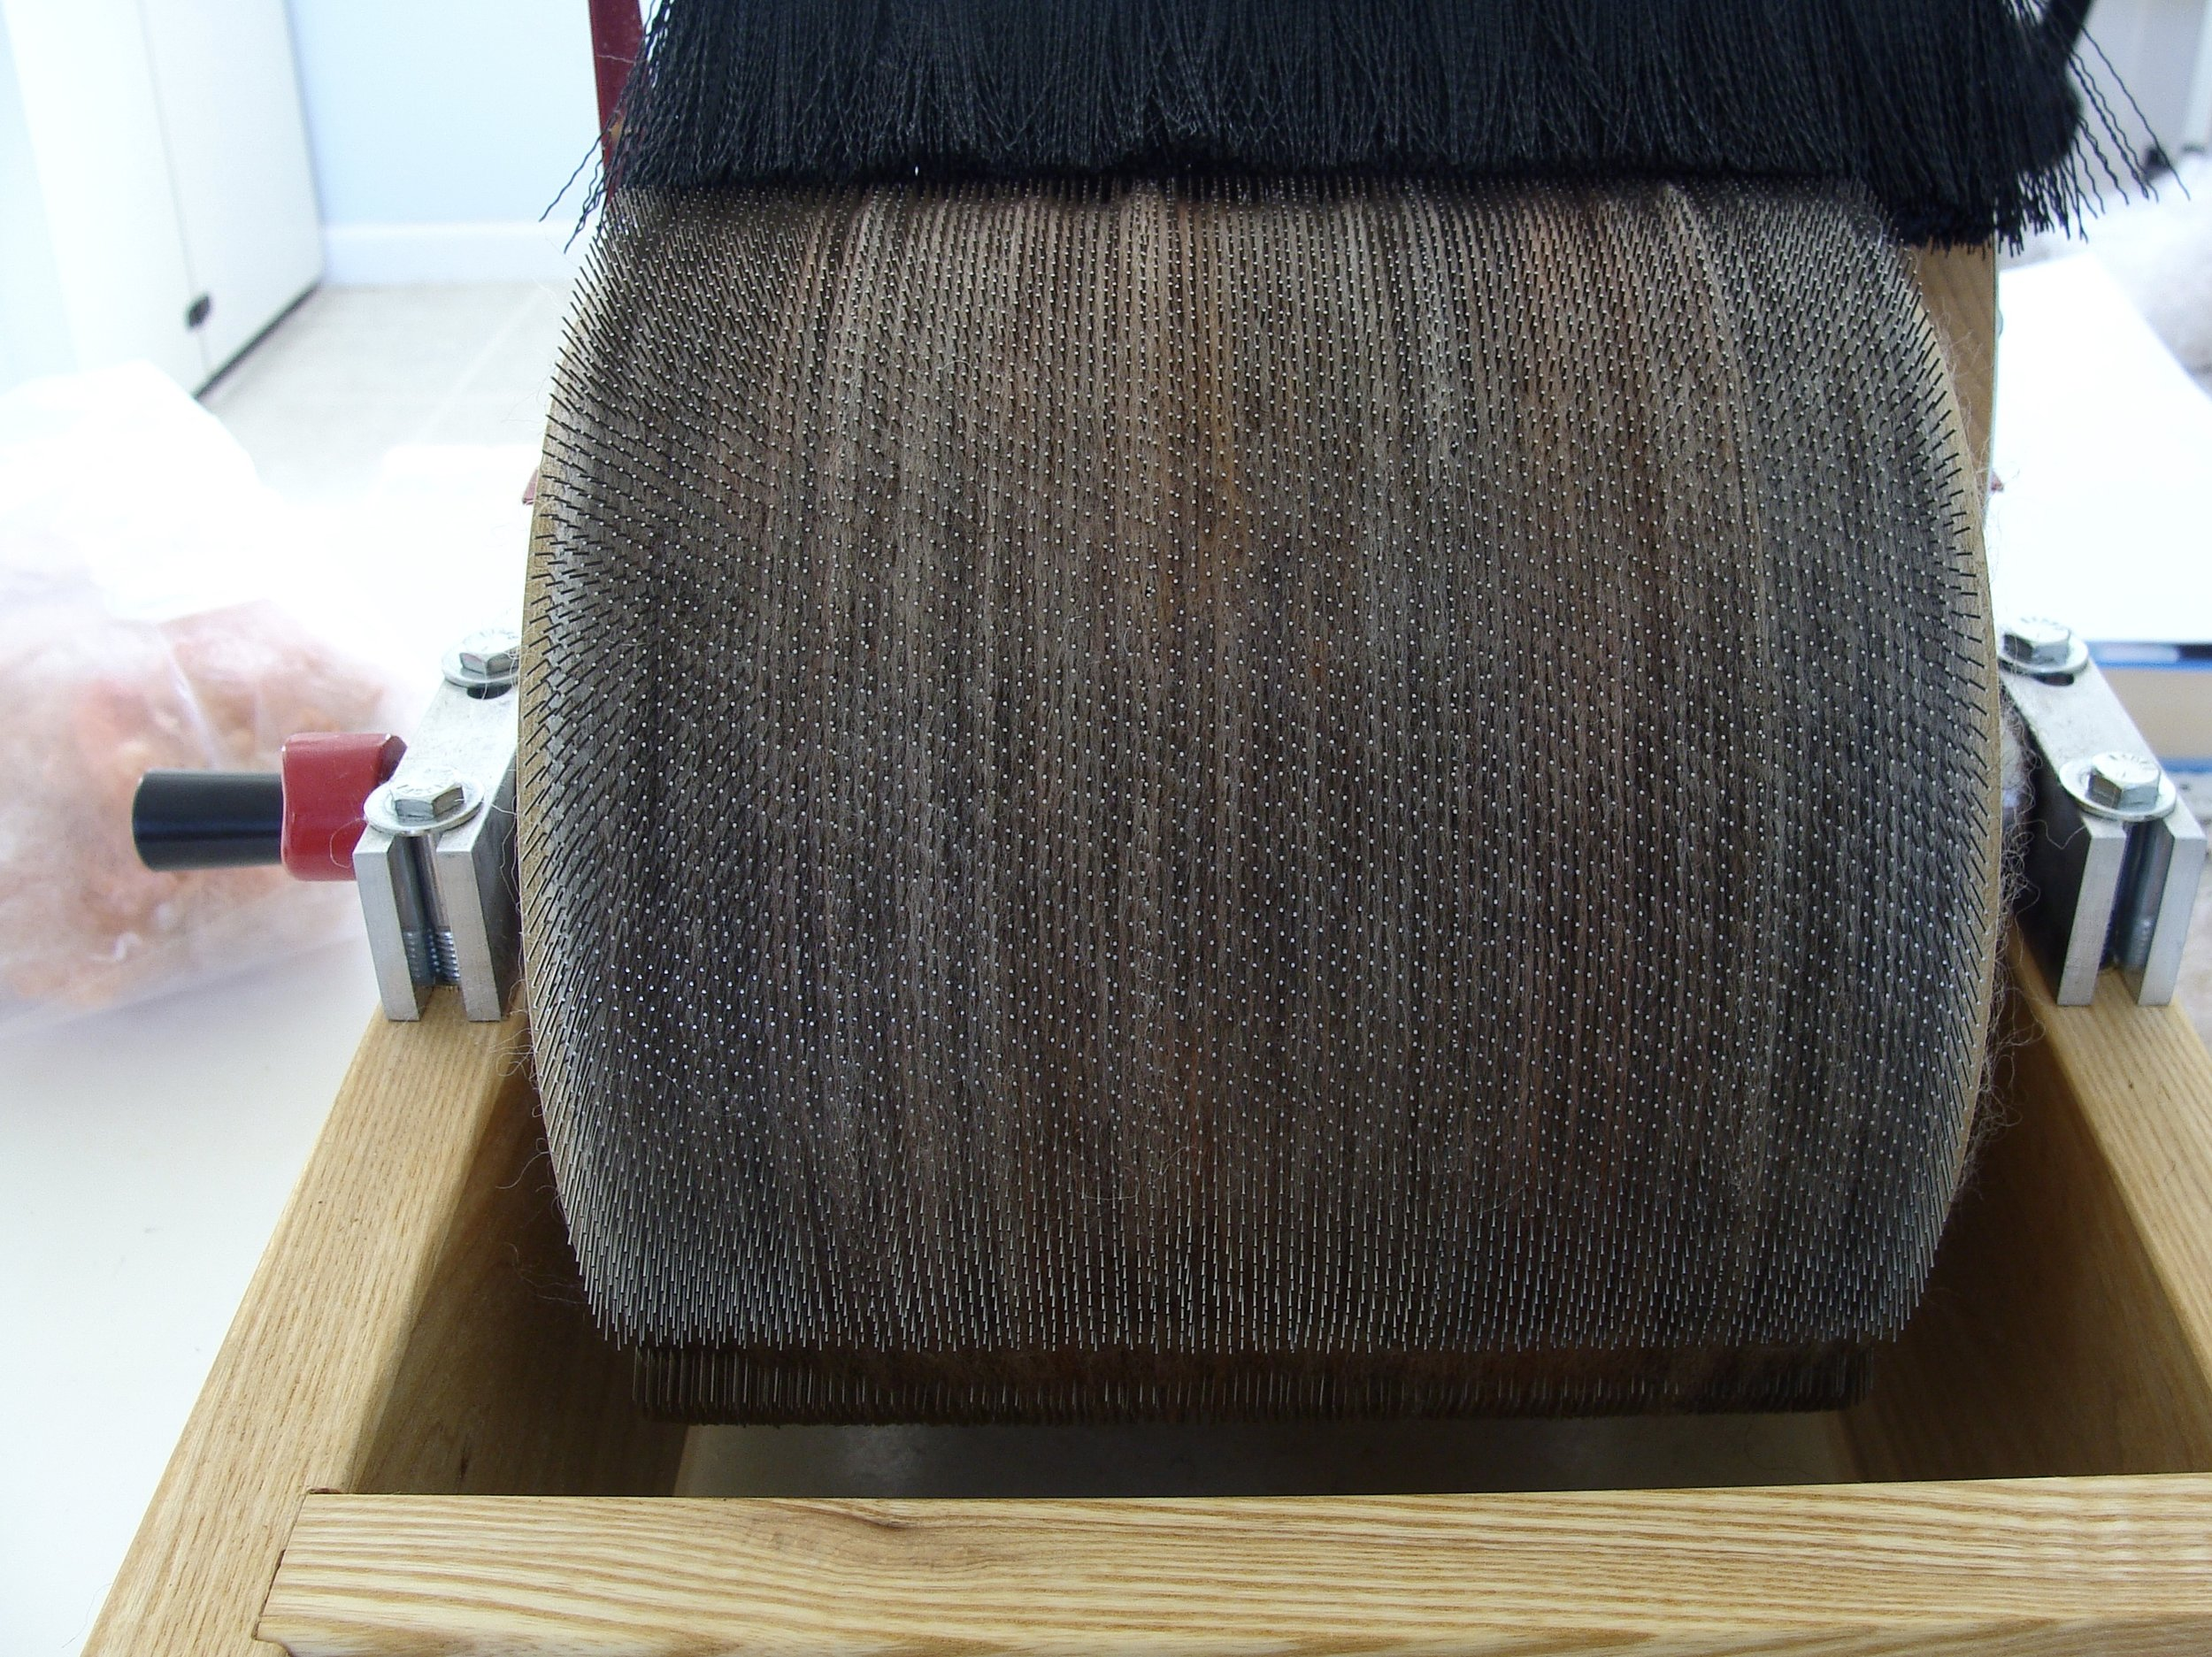 Drumcarding for color blending Romney wool